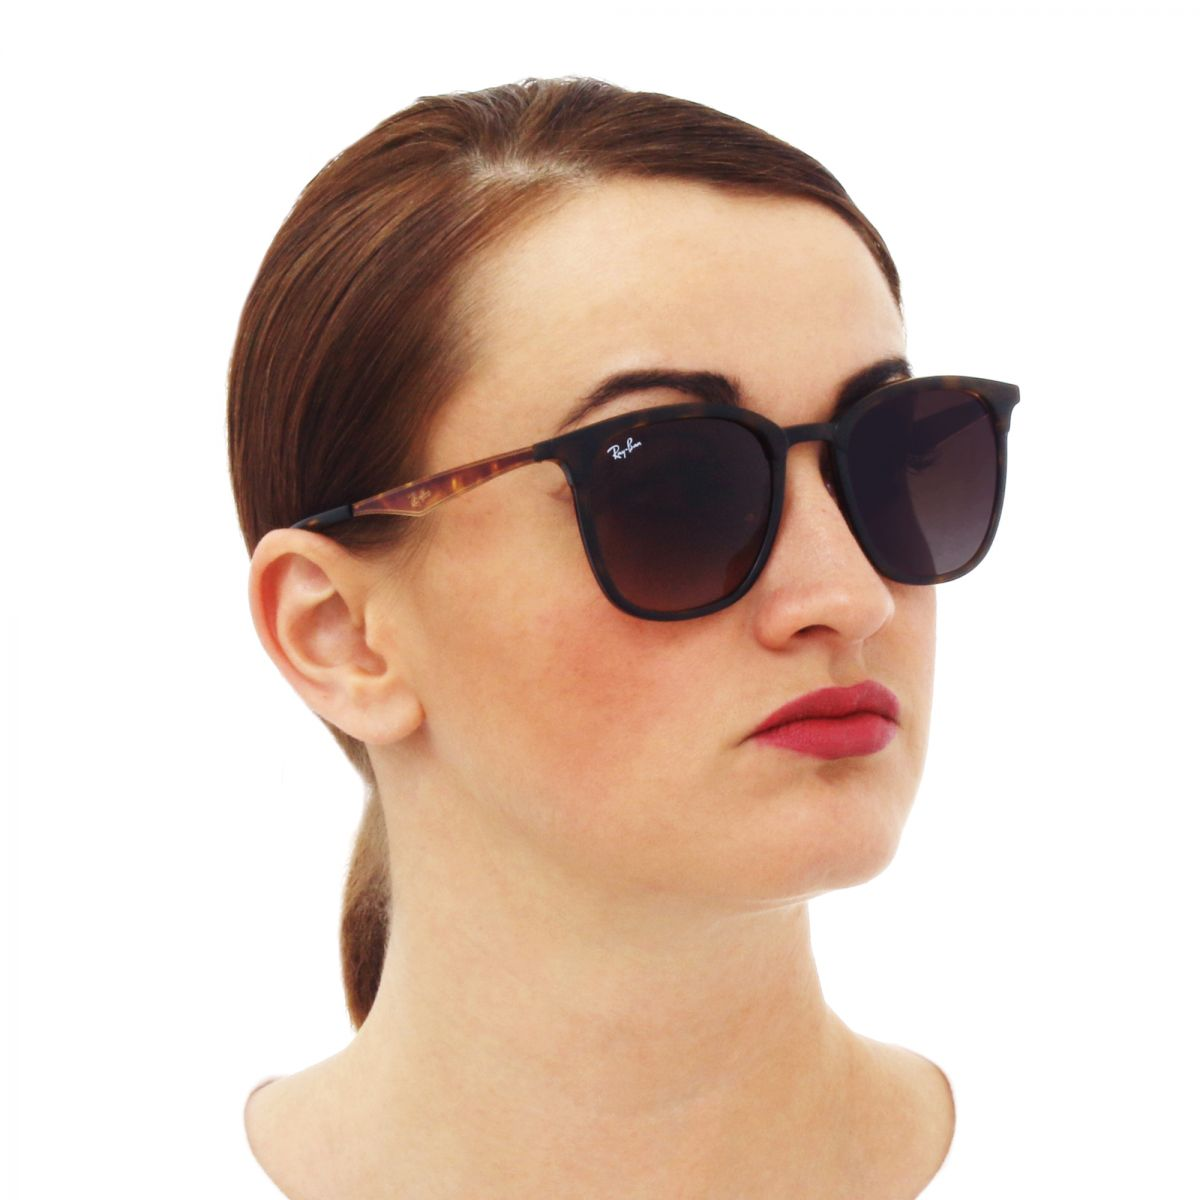 a826e91026 ray ban rb4278,Ray-Ban RB 4278 62829A Black Matte Black Plastic Sunglasses  Green .